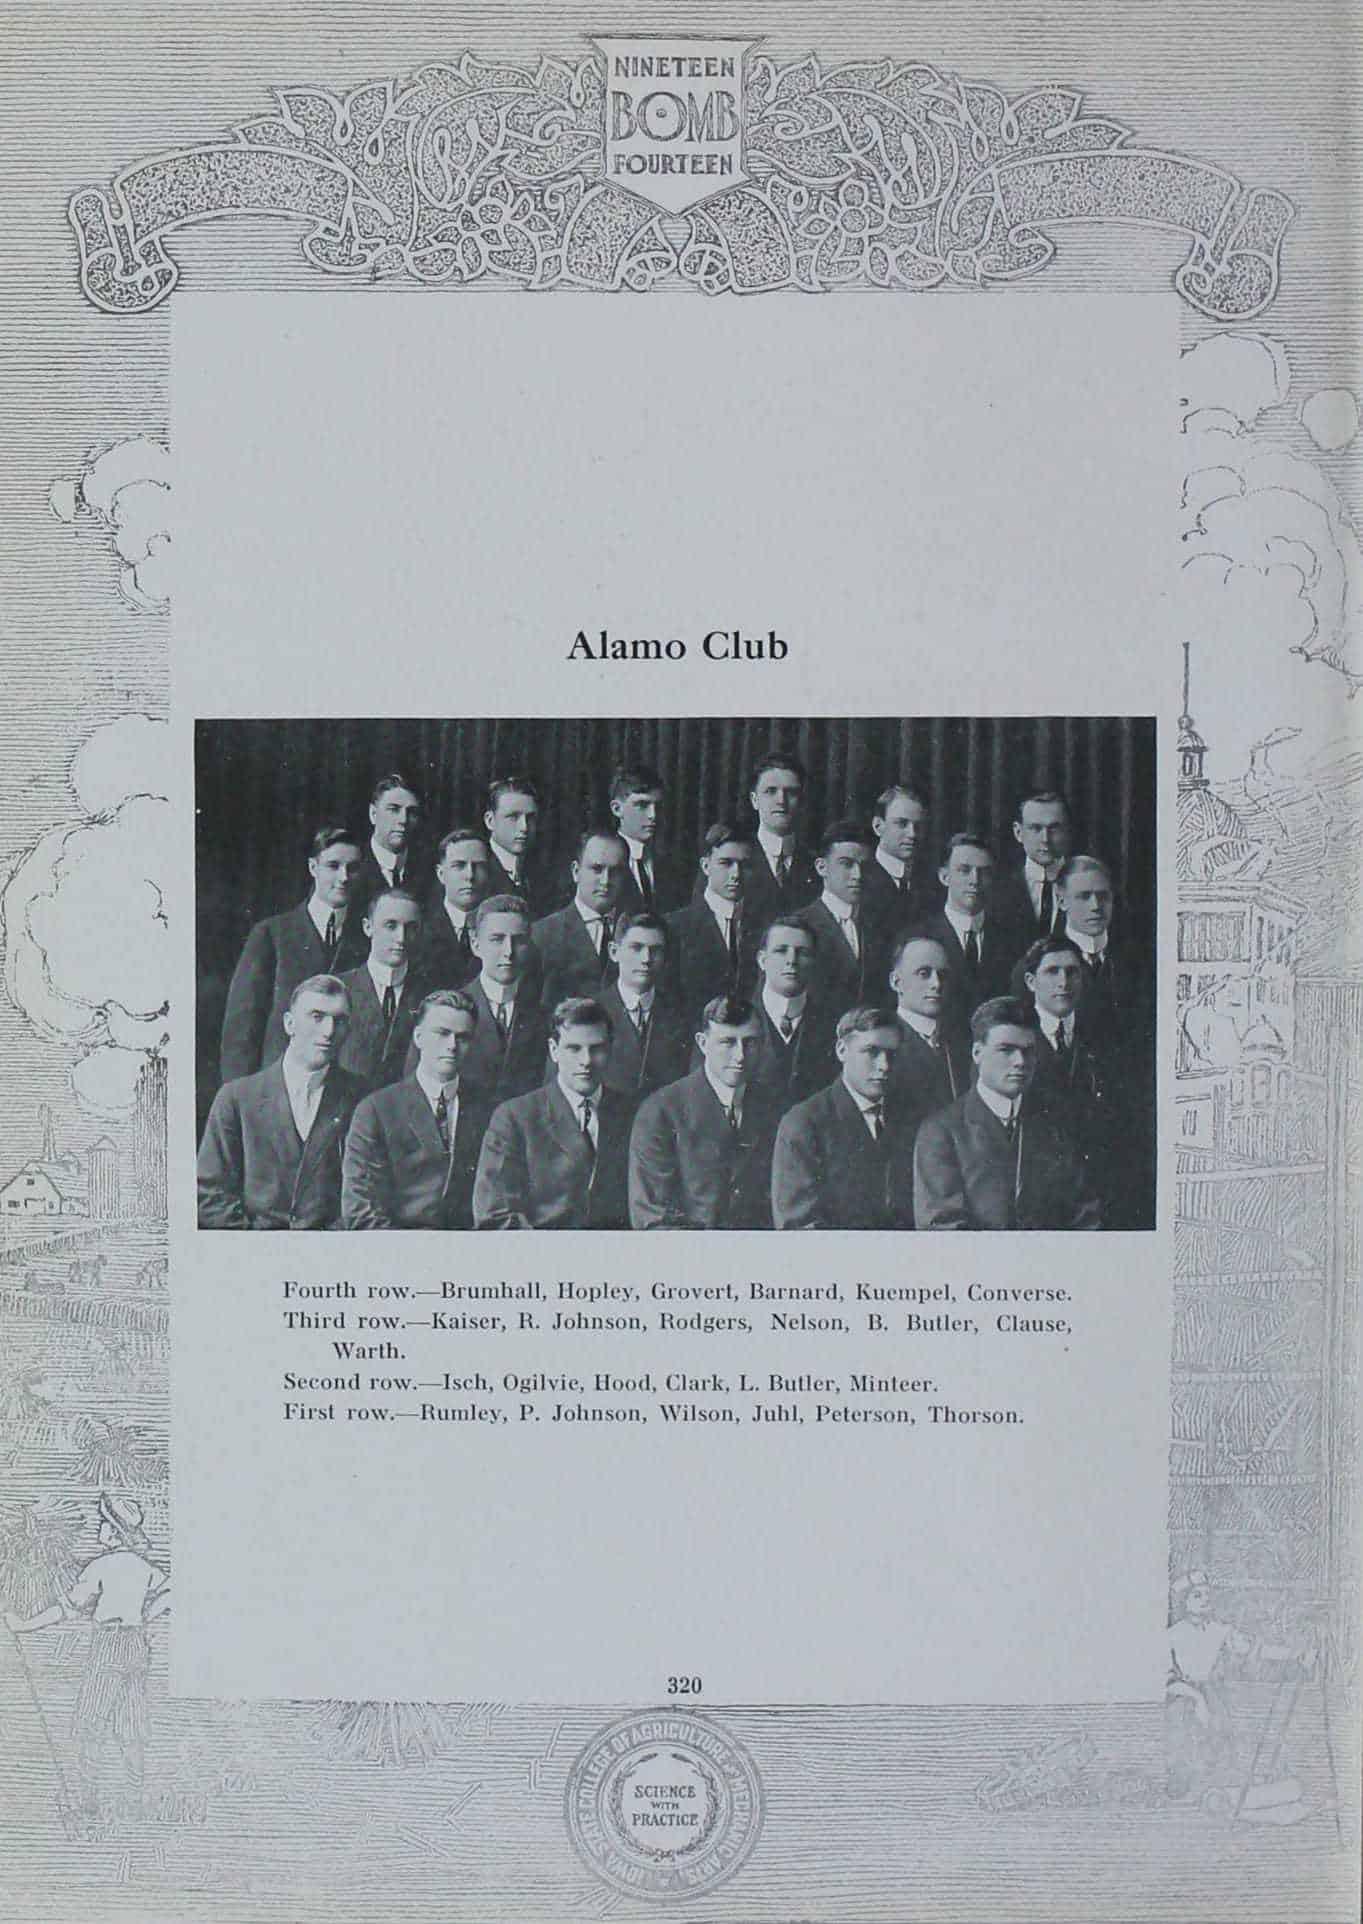 1913 Alamo Club